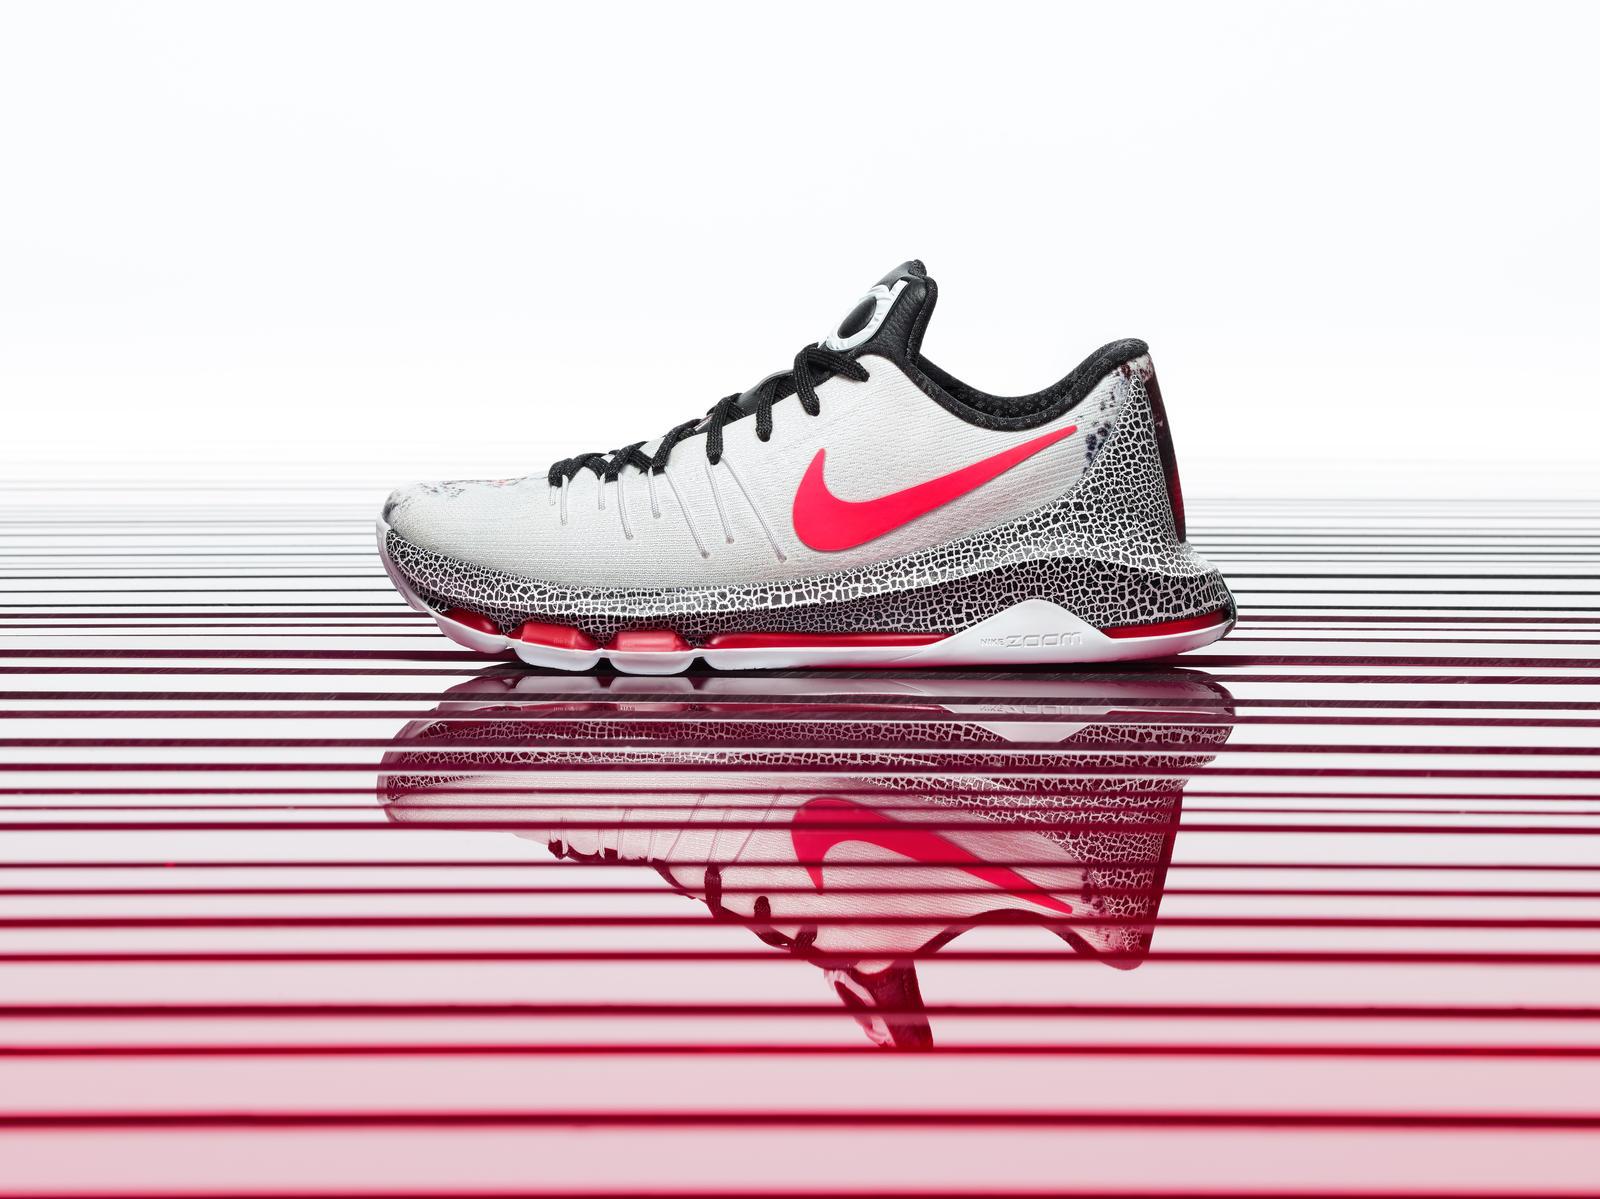 Nike KD 8 Christmas Pack